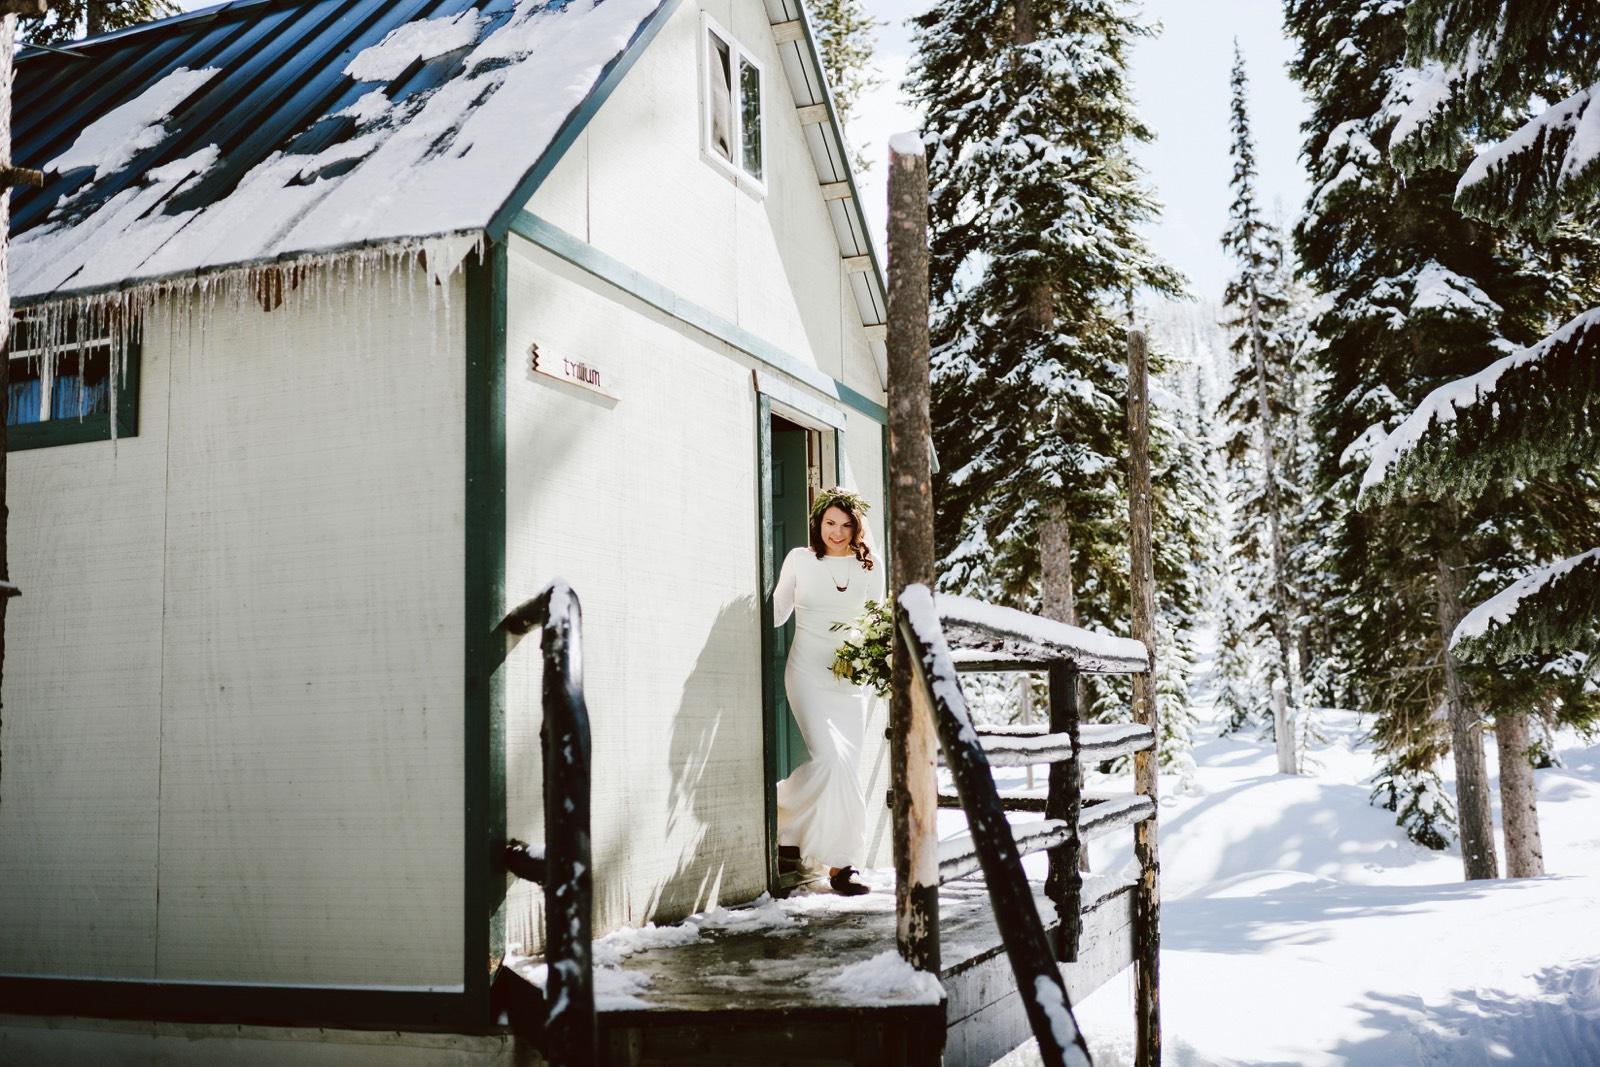 alpine-lakes-high-camp-winter-wedding-15 ALPINE LAKES HIGH CAMP WEDDING